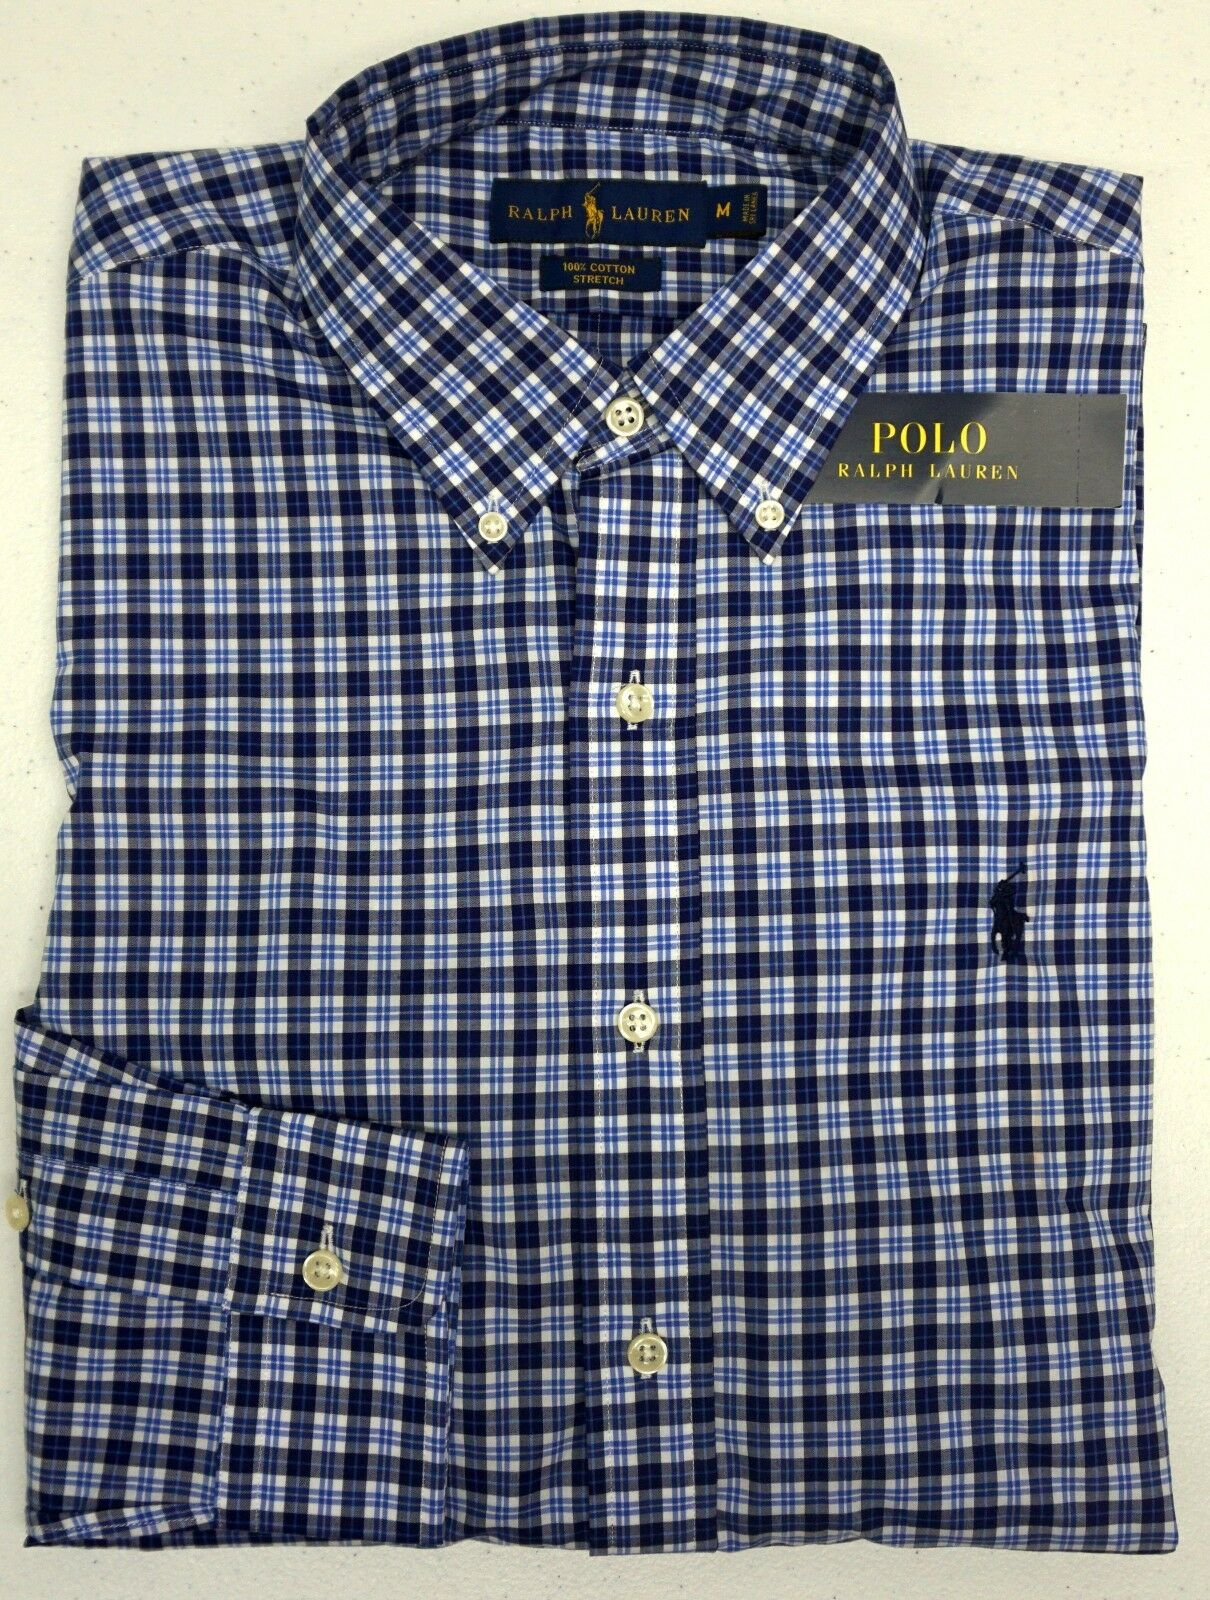 NWT  Polo Ralph Lauren Long Sleeve Stretch Shirt Mens M  bluee Plaid NEW